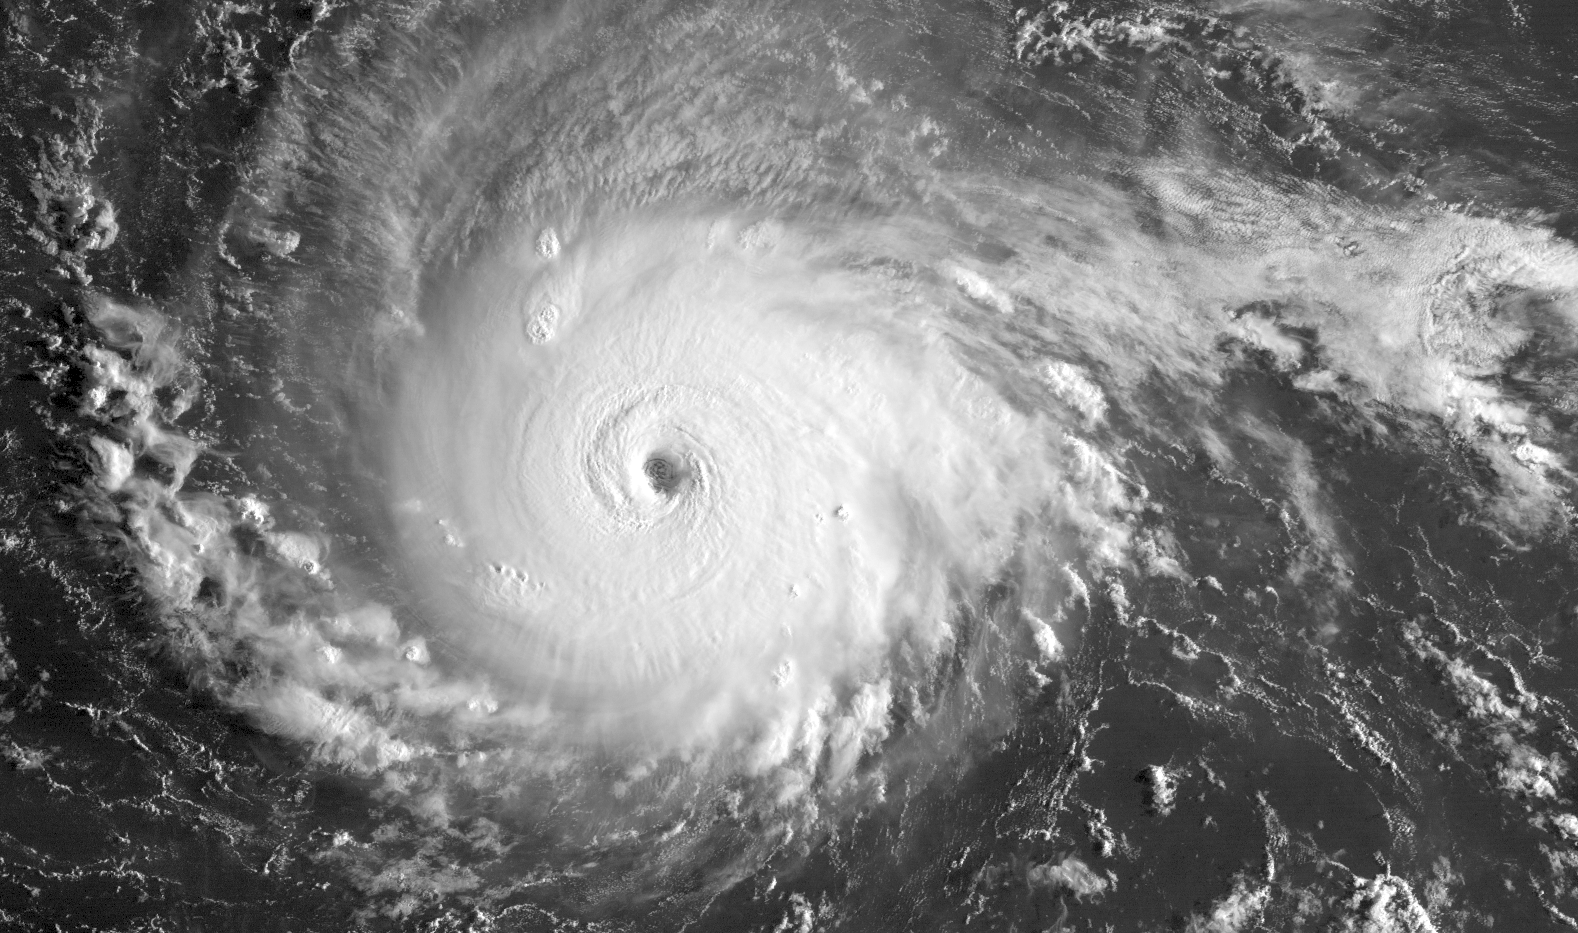 Irma_Geostationary_VIS-IR_2017.png